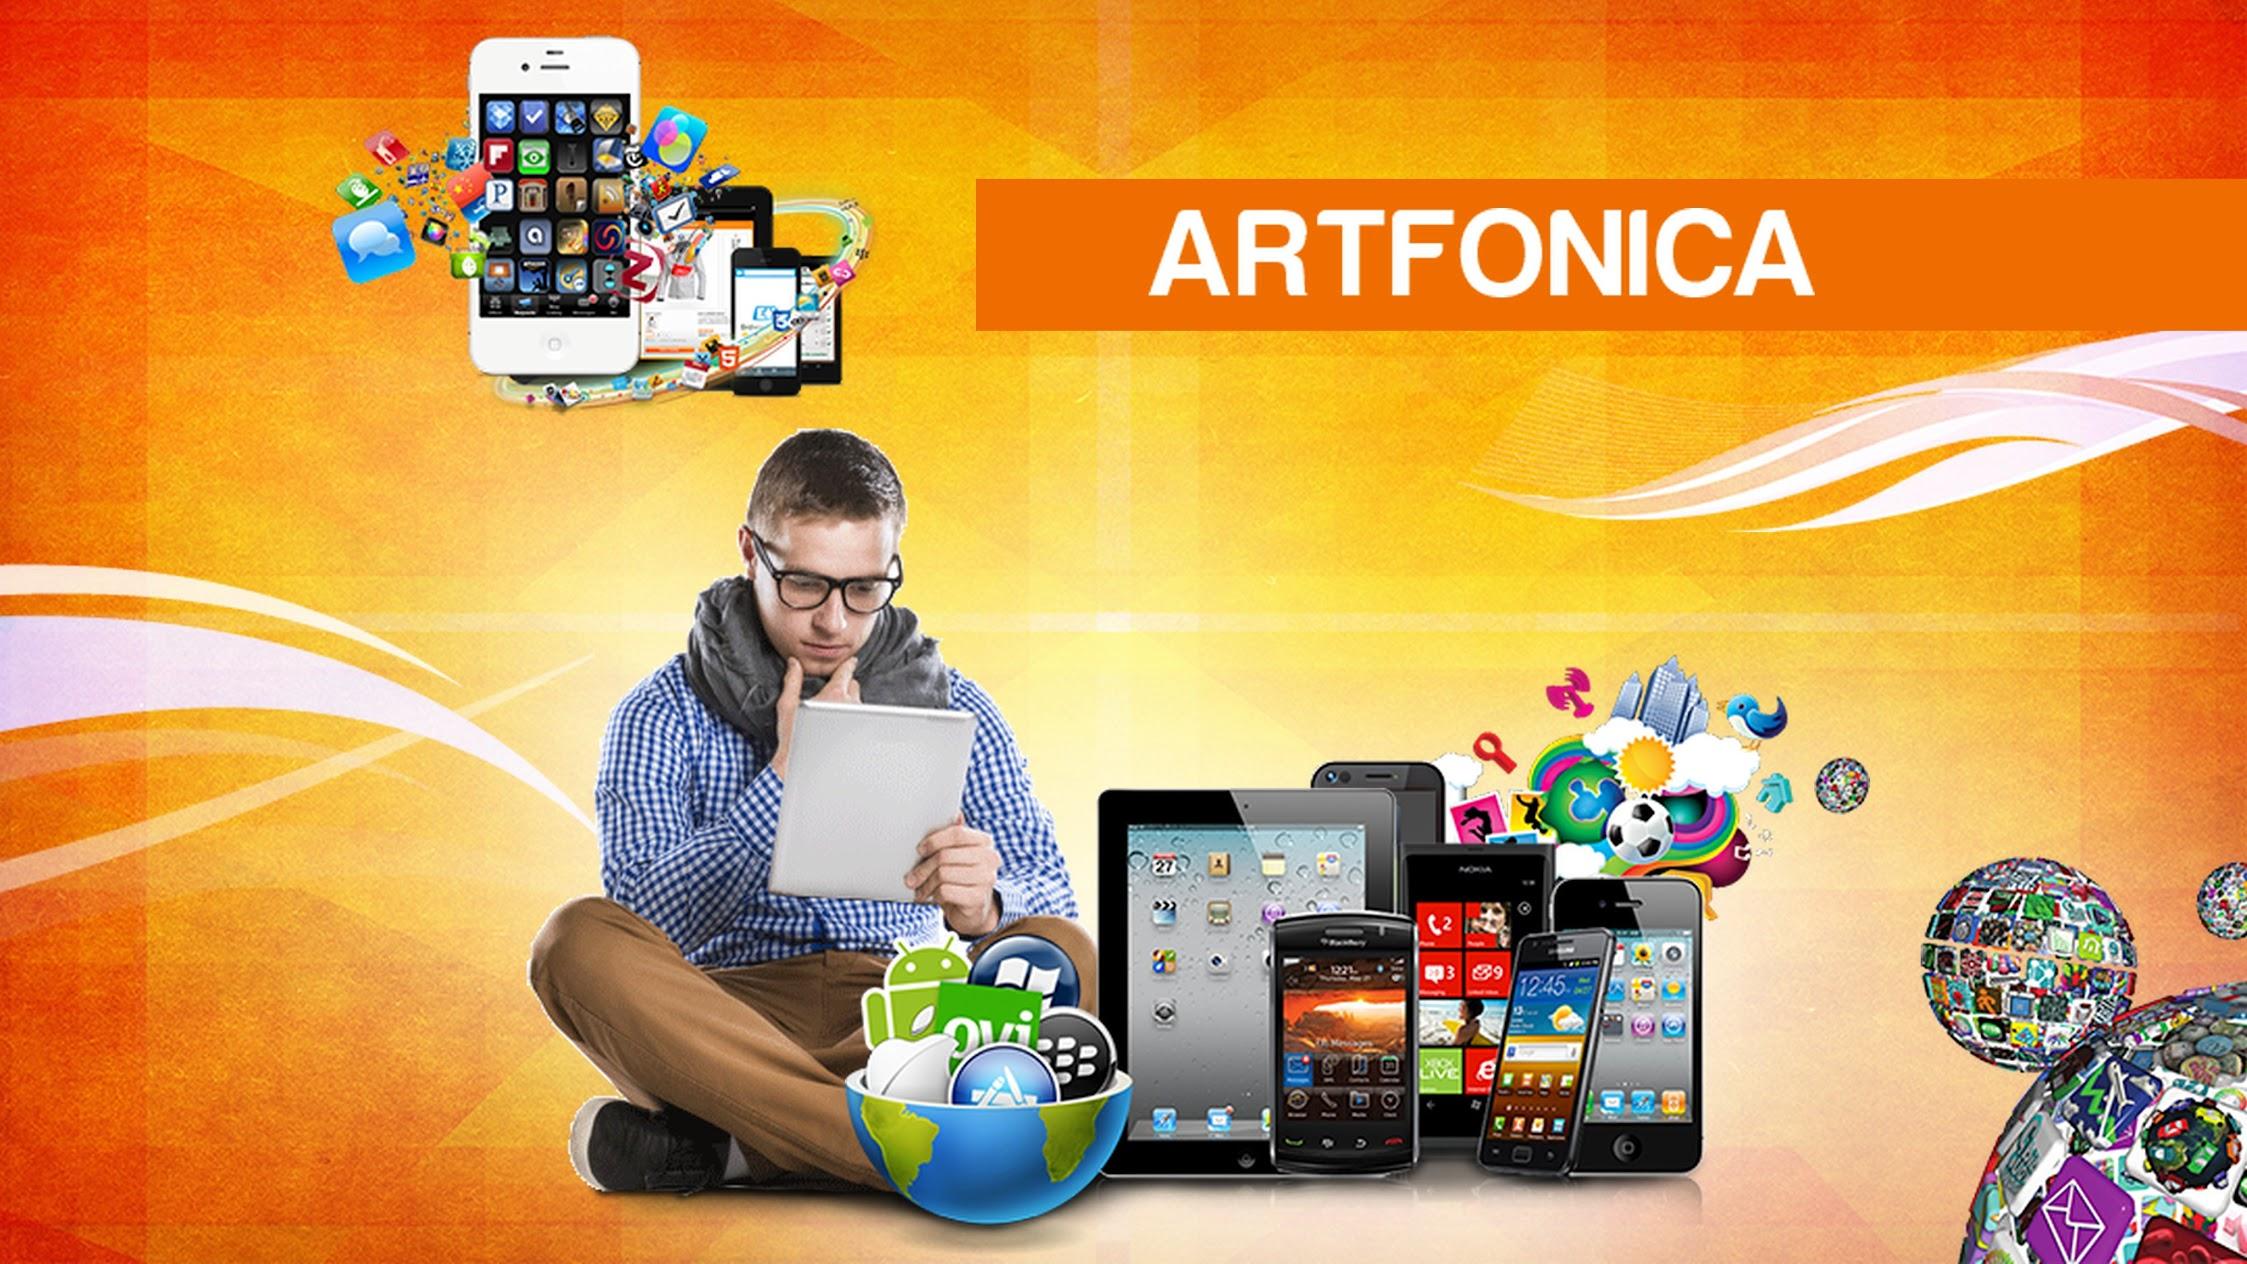 Artfonica